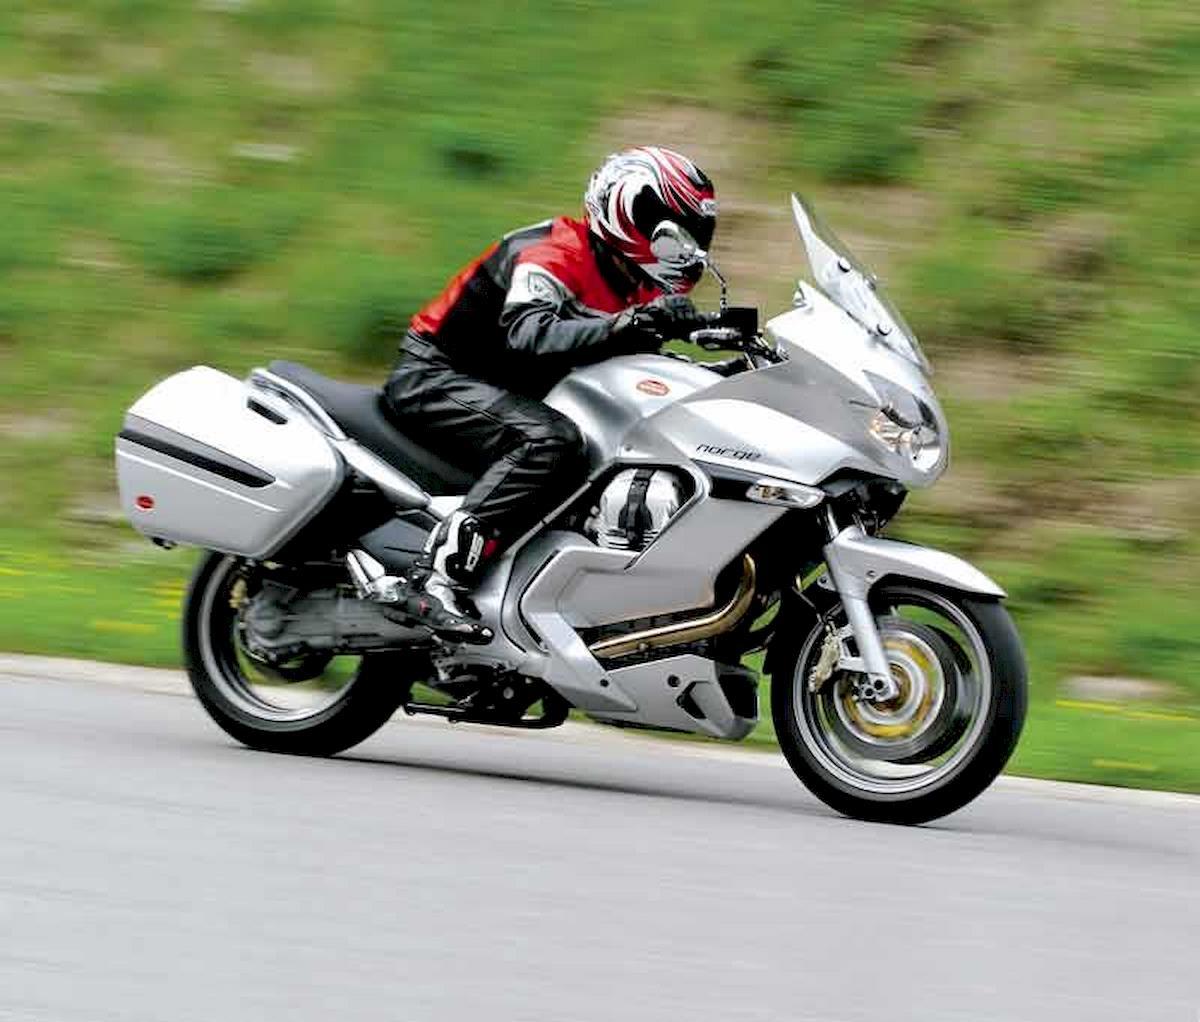 Image of MOTO GUZZI NORGE 1200